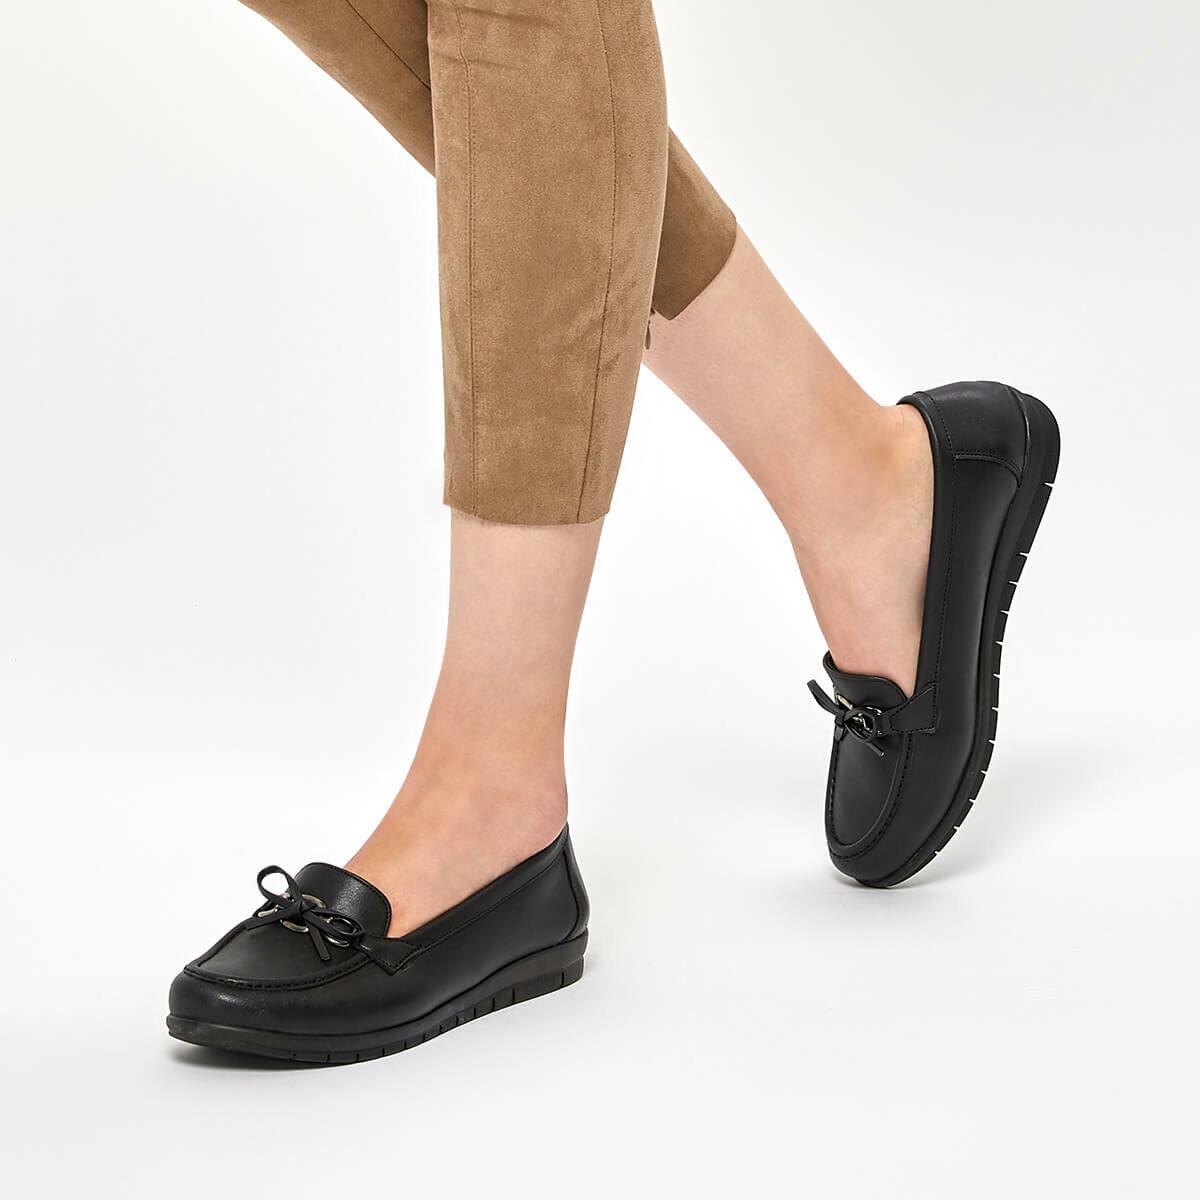 FLO 92.156915.Z Black Women Basic Comfort Polaris